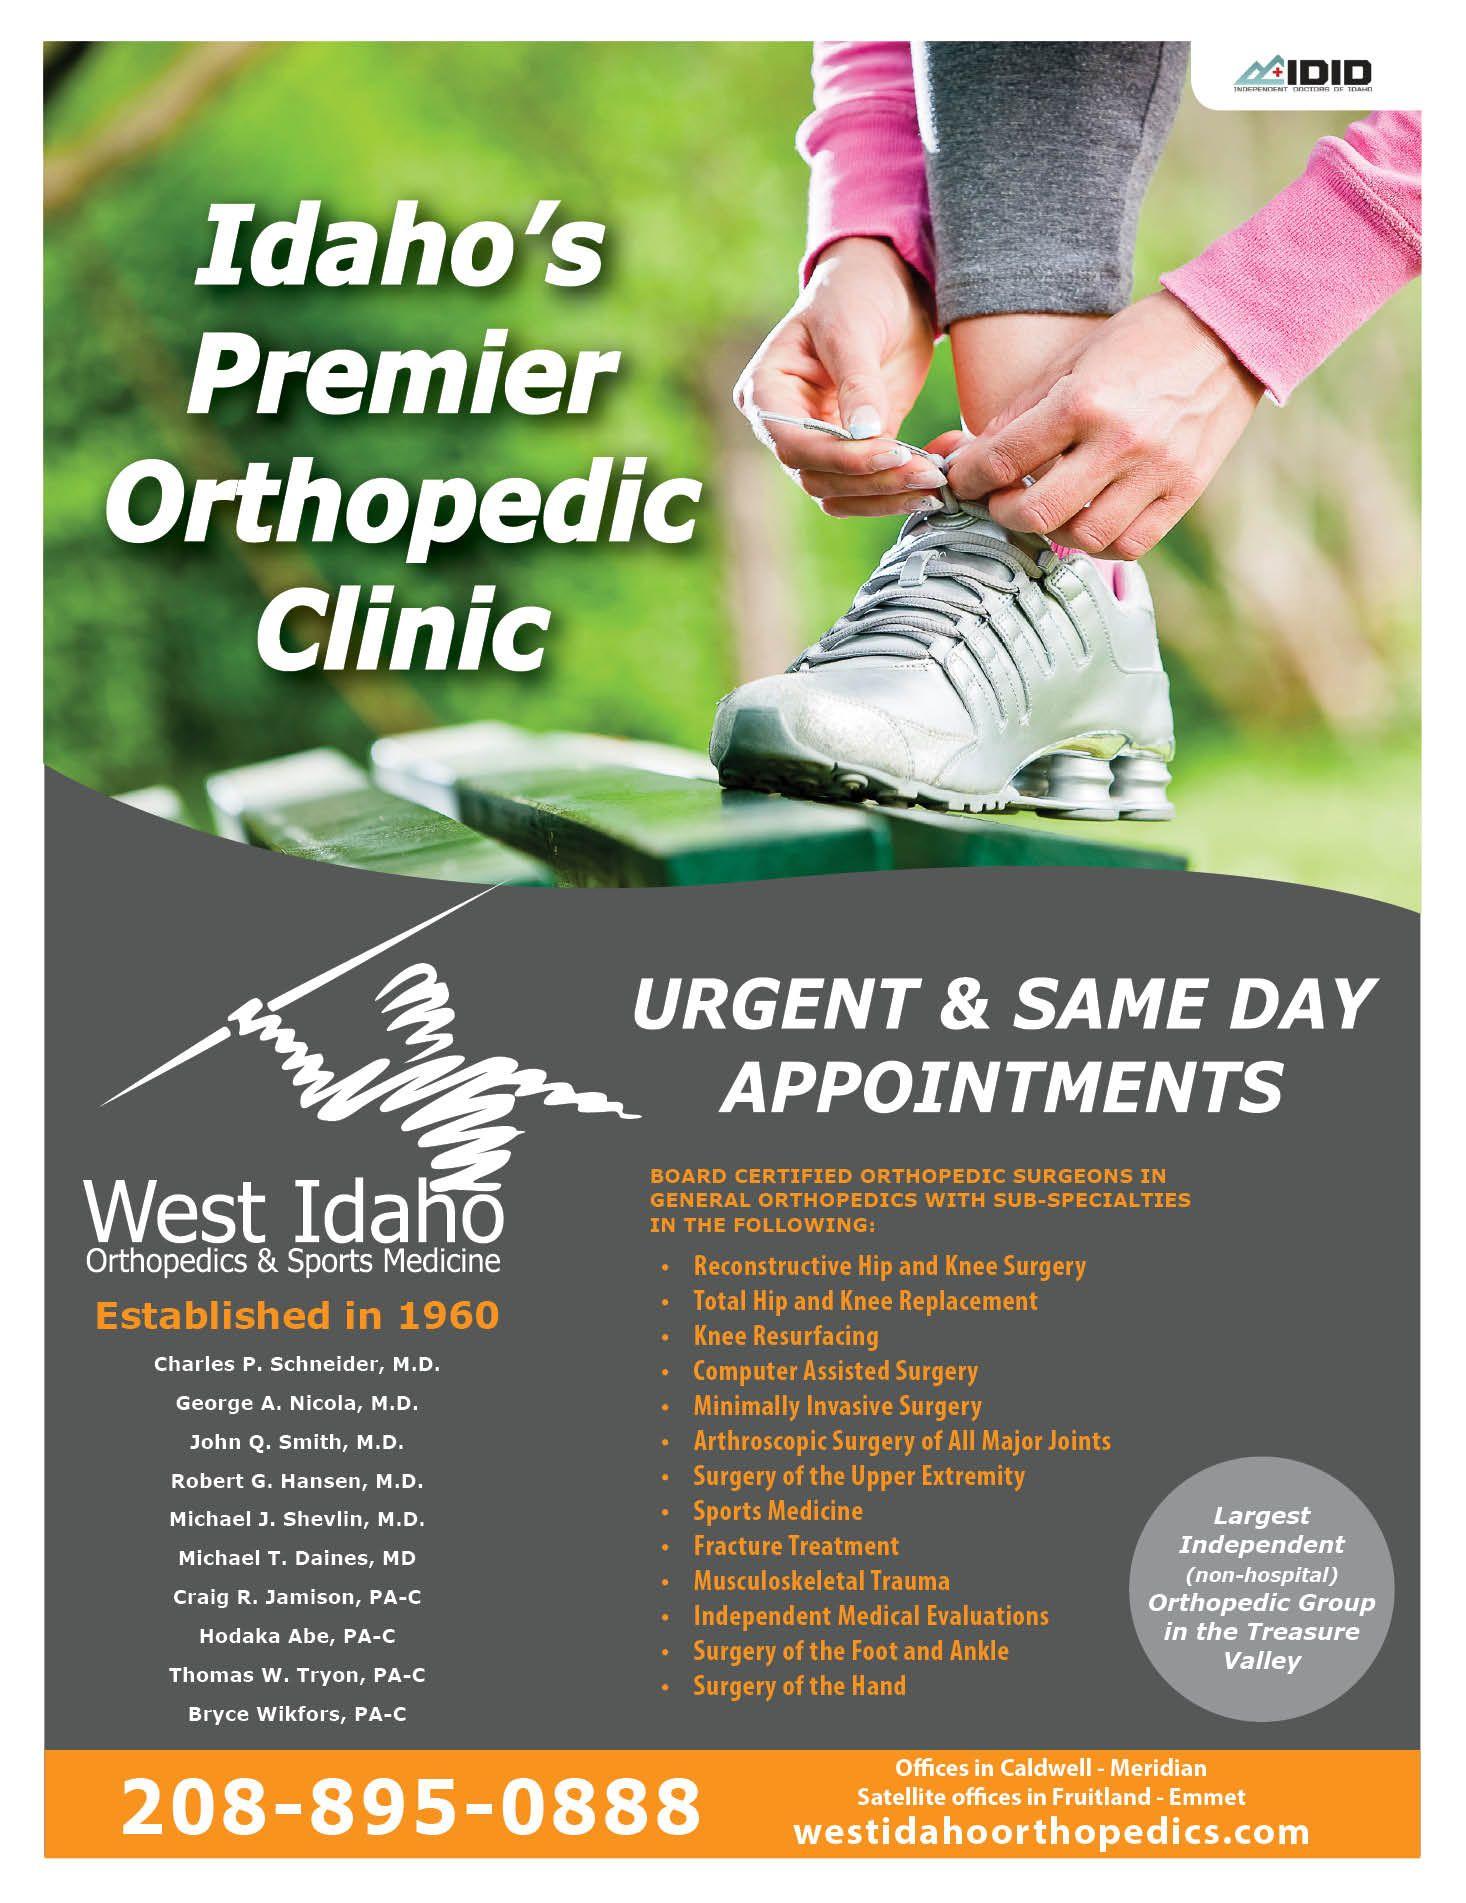 West Idaho Orthopedics And Sports Medicine Serving Boise